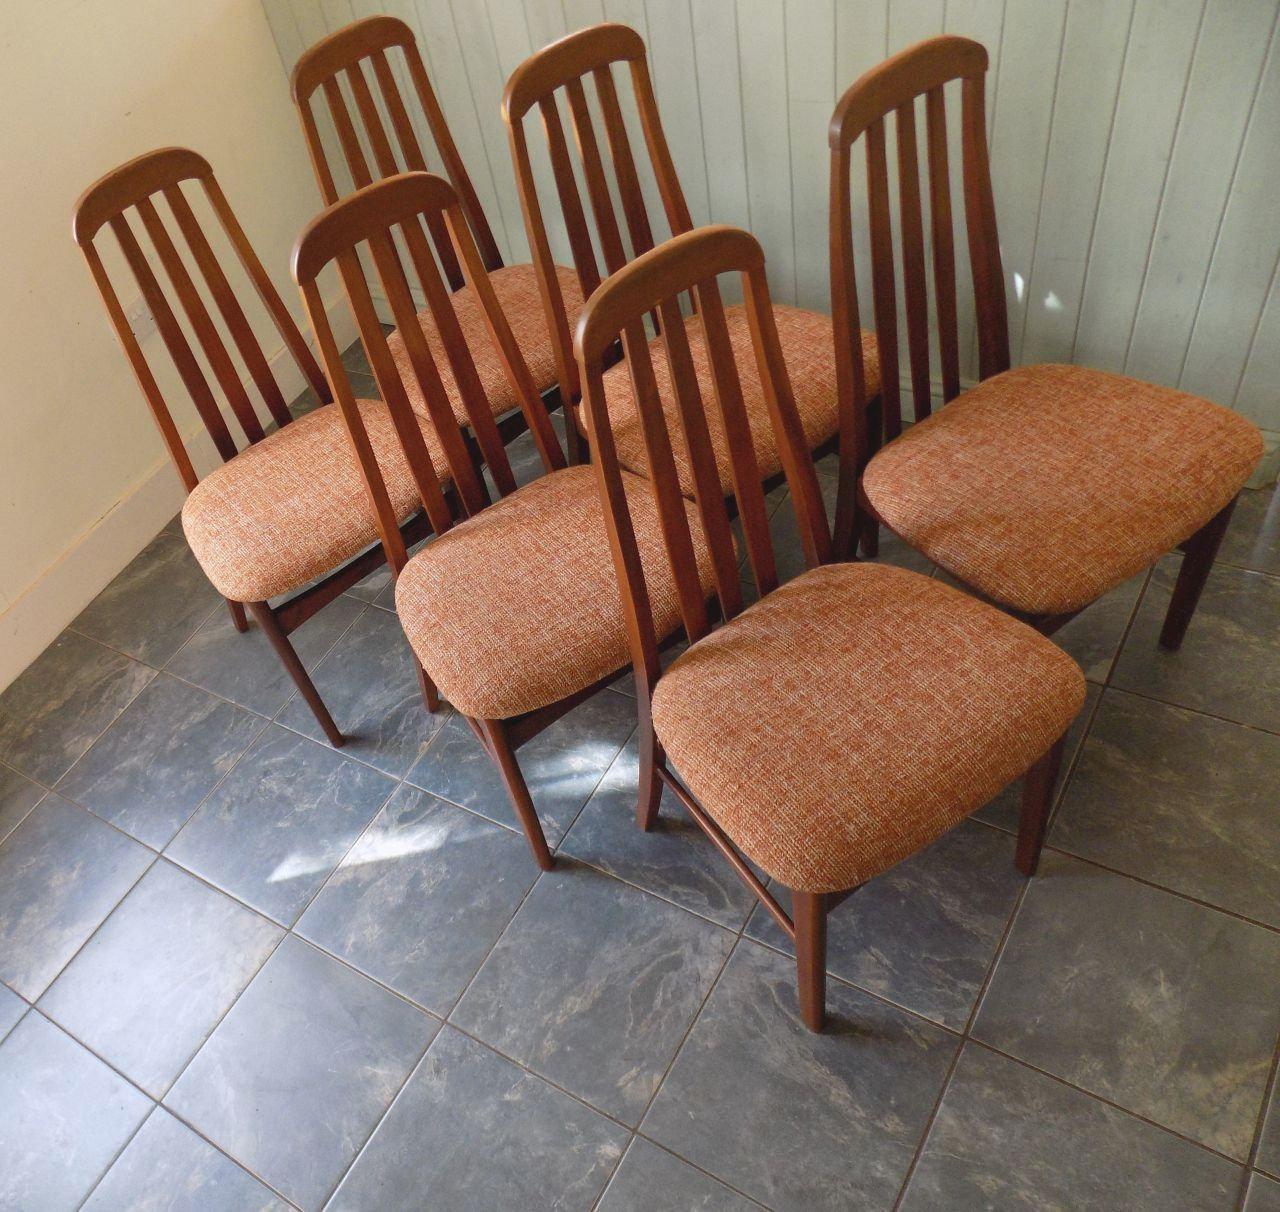 Fine Jentique Teak Dining Chairs Set Of 6 Scandinavian Style Vintage Mid Century Sixties Lamtechconsult Wood Chair Design Ideas Lamtechconsultcom